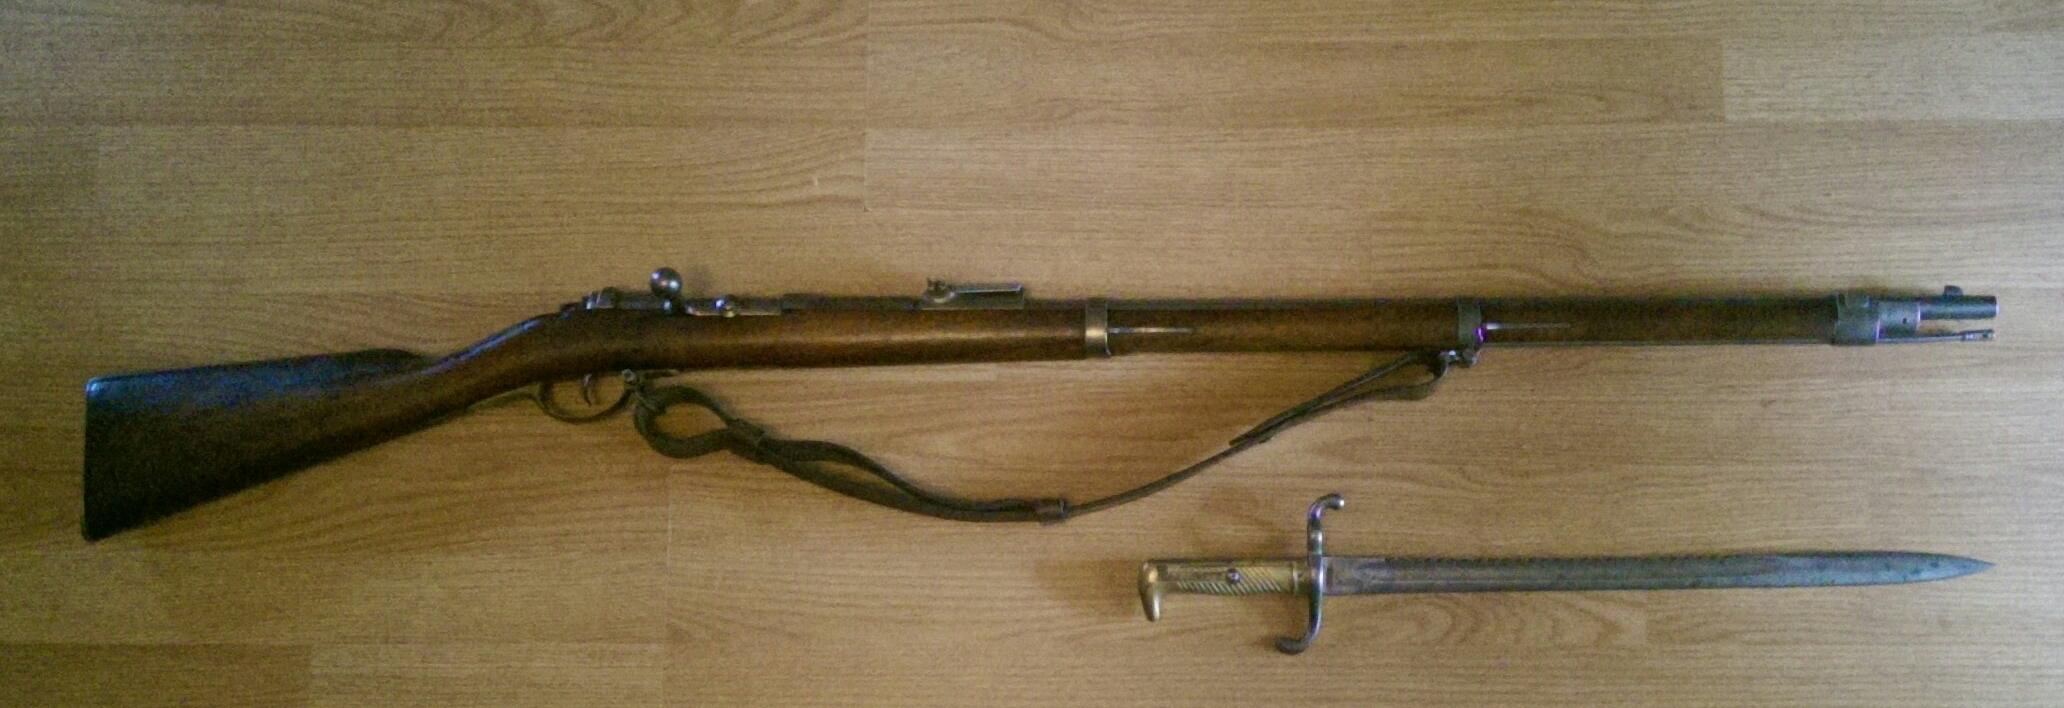 German Mauser 1871 Infantry Gewehr from the Asgard